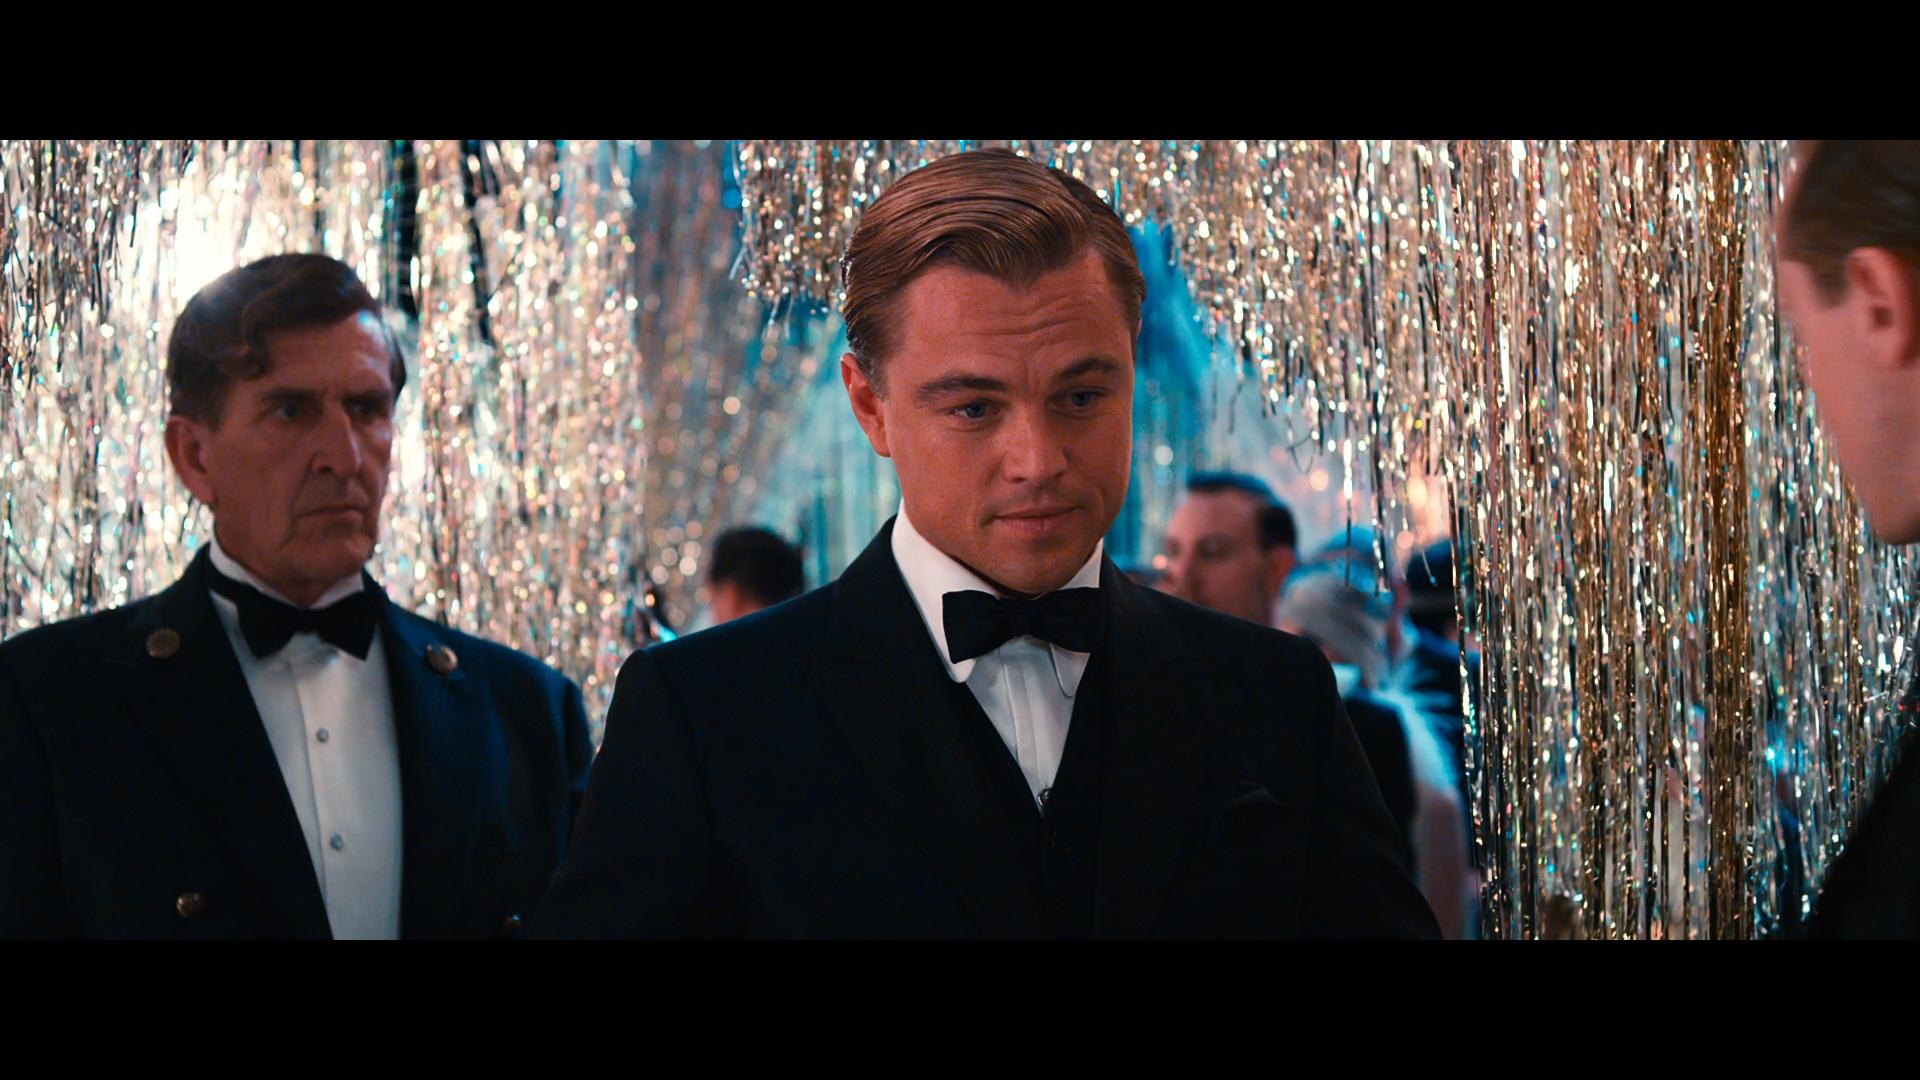 Gatsby buchkritik